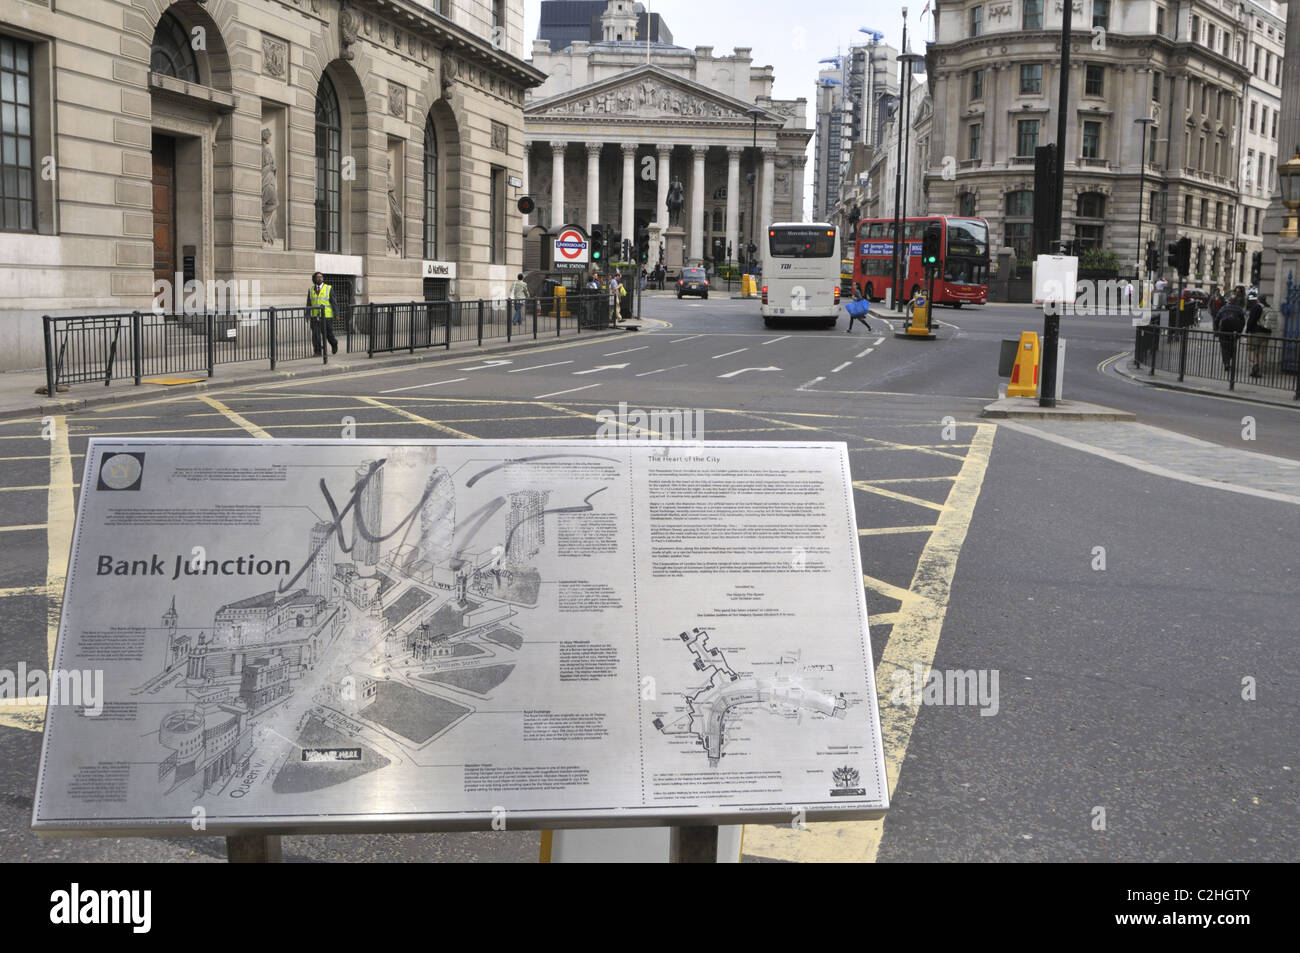 Bank Junction, London, UK. - Stock Image